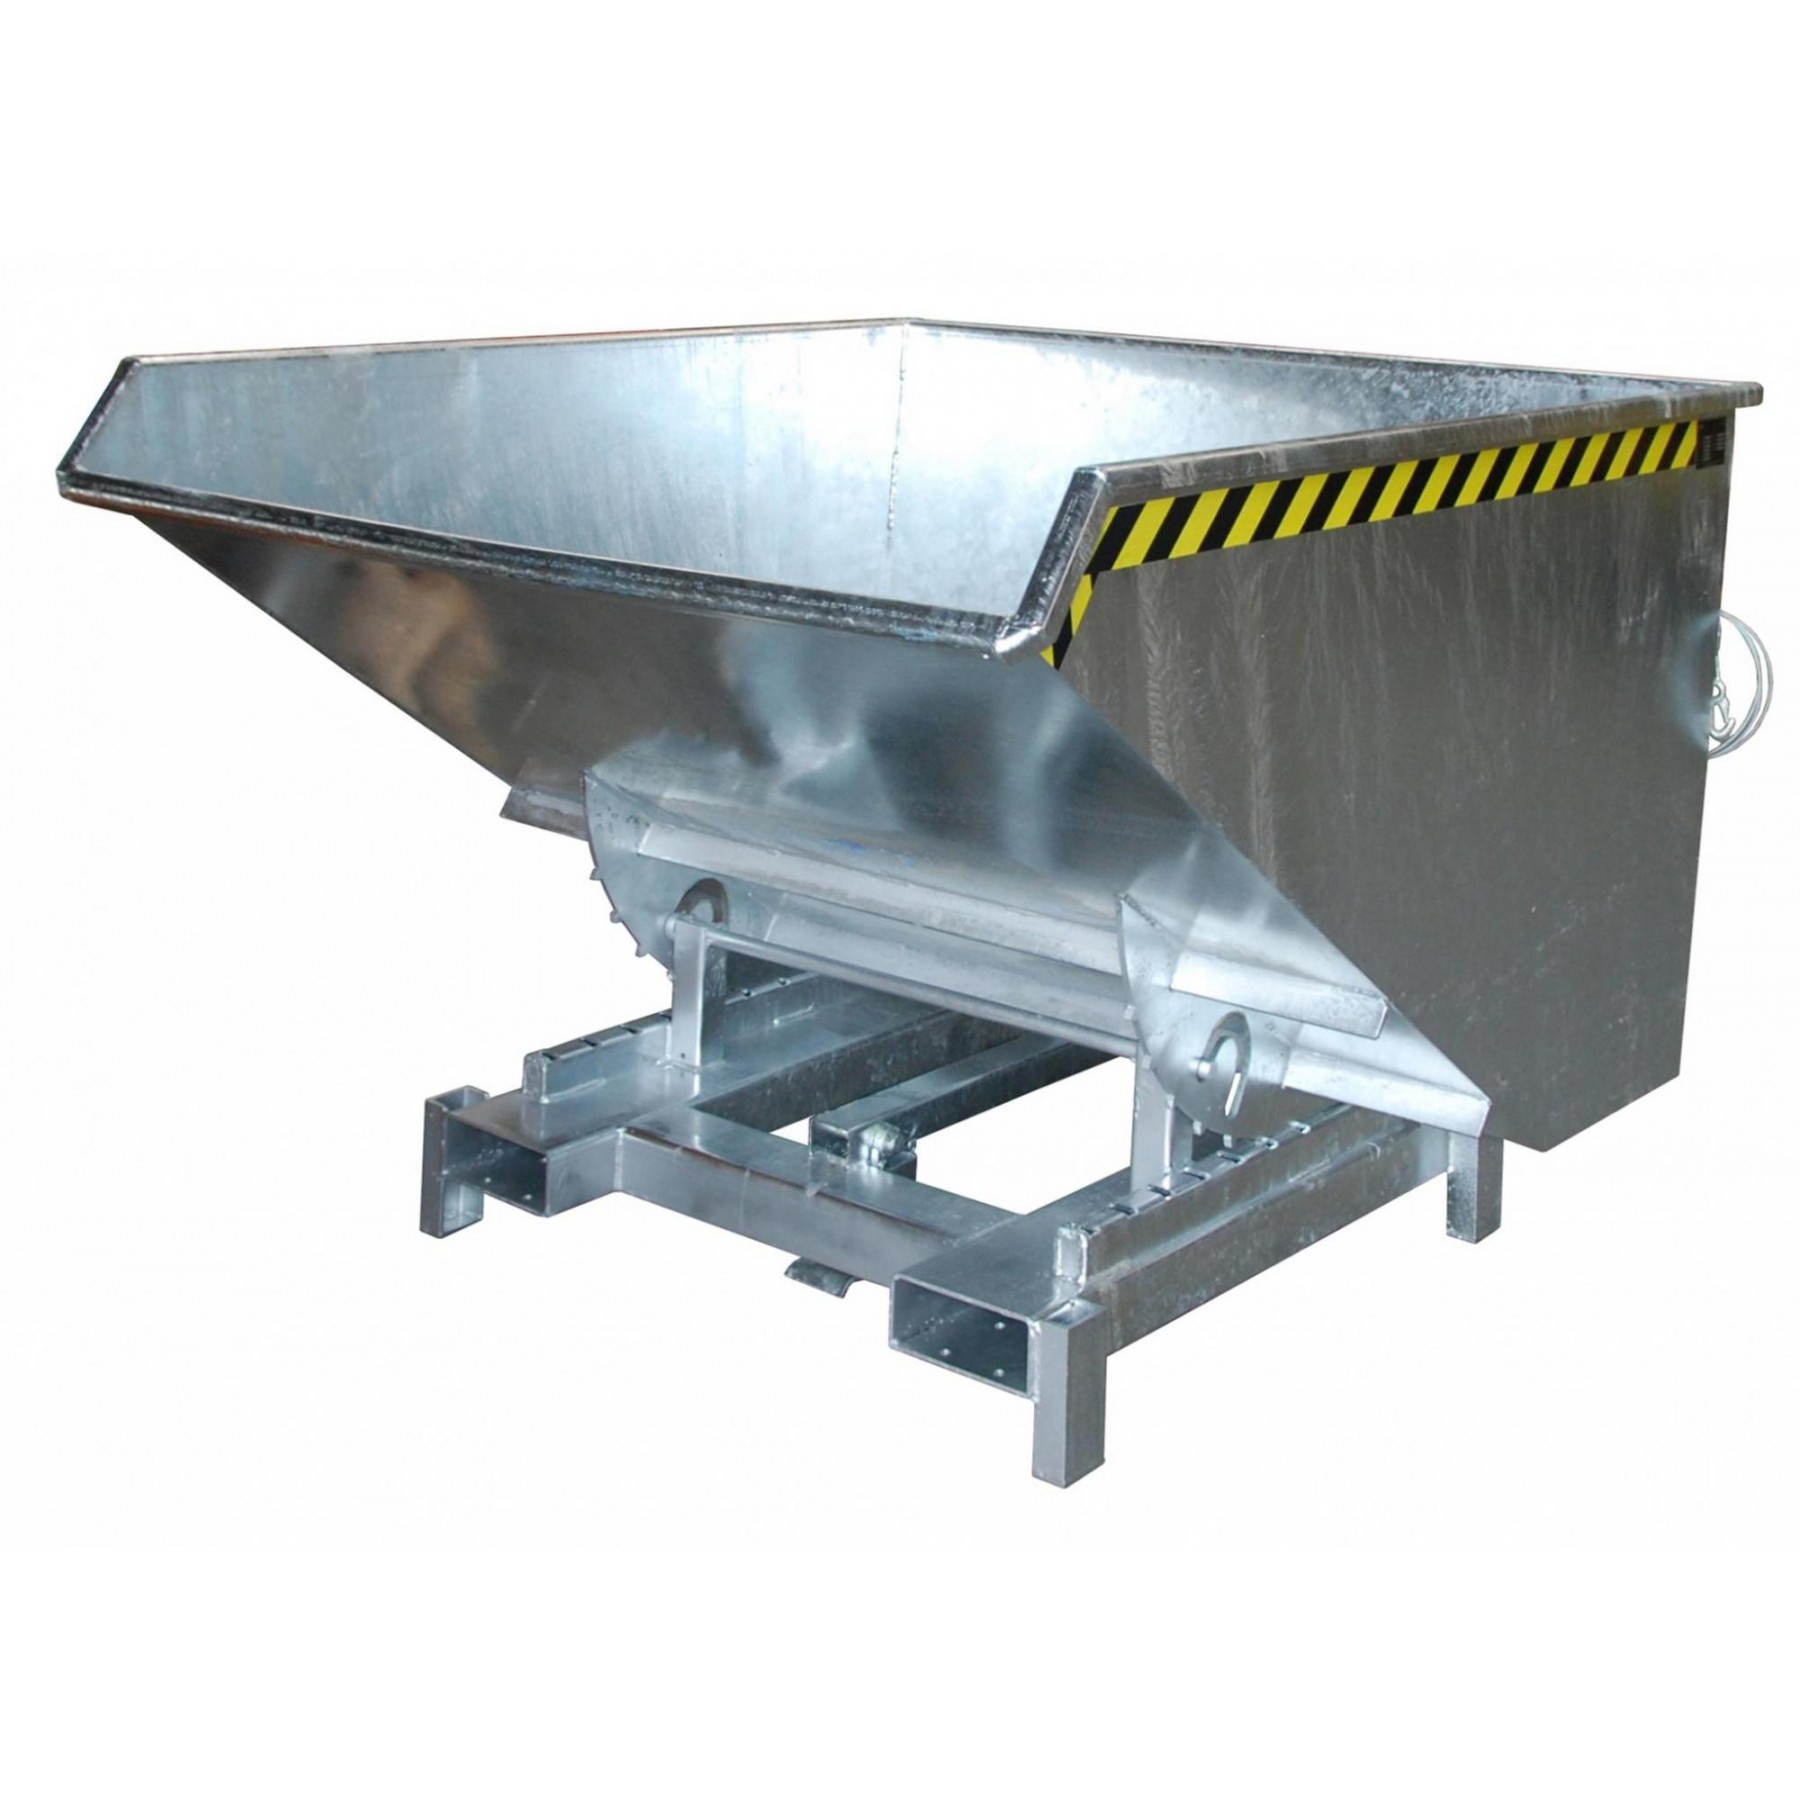 Kiepcontainer extra zwaar 2100 liter, MTF-SK-2100-V